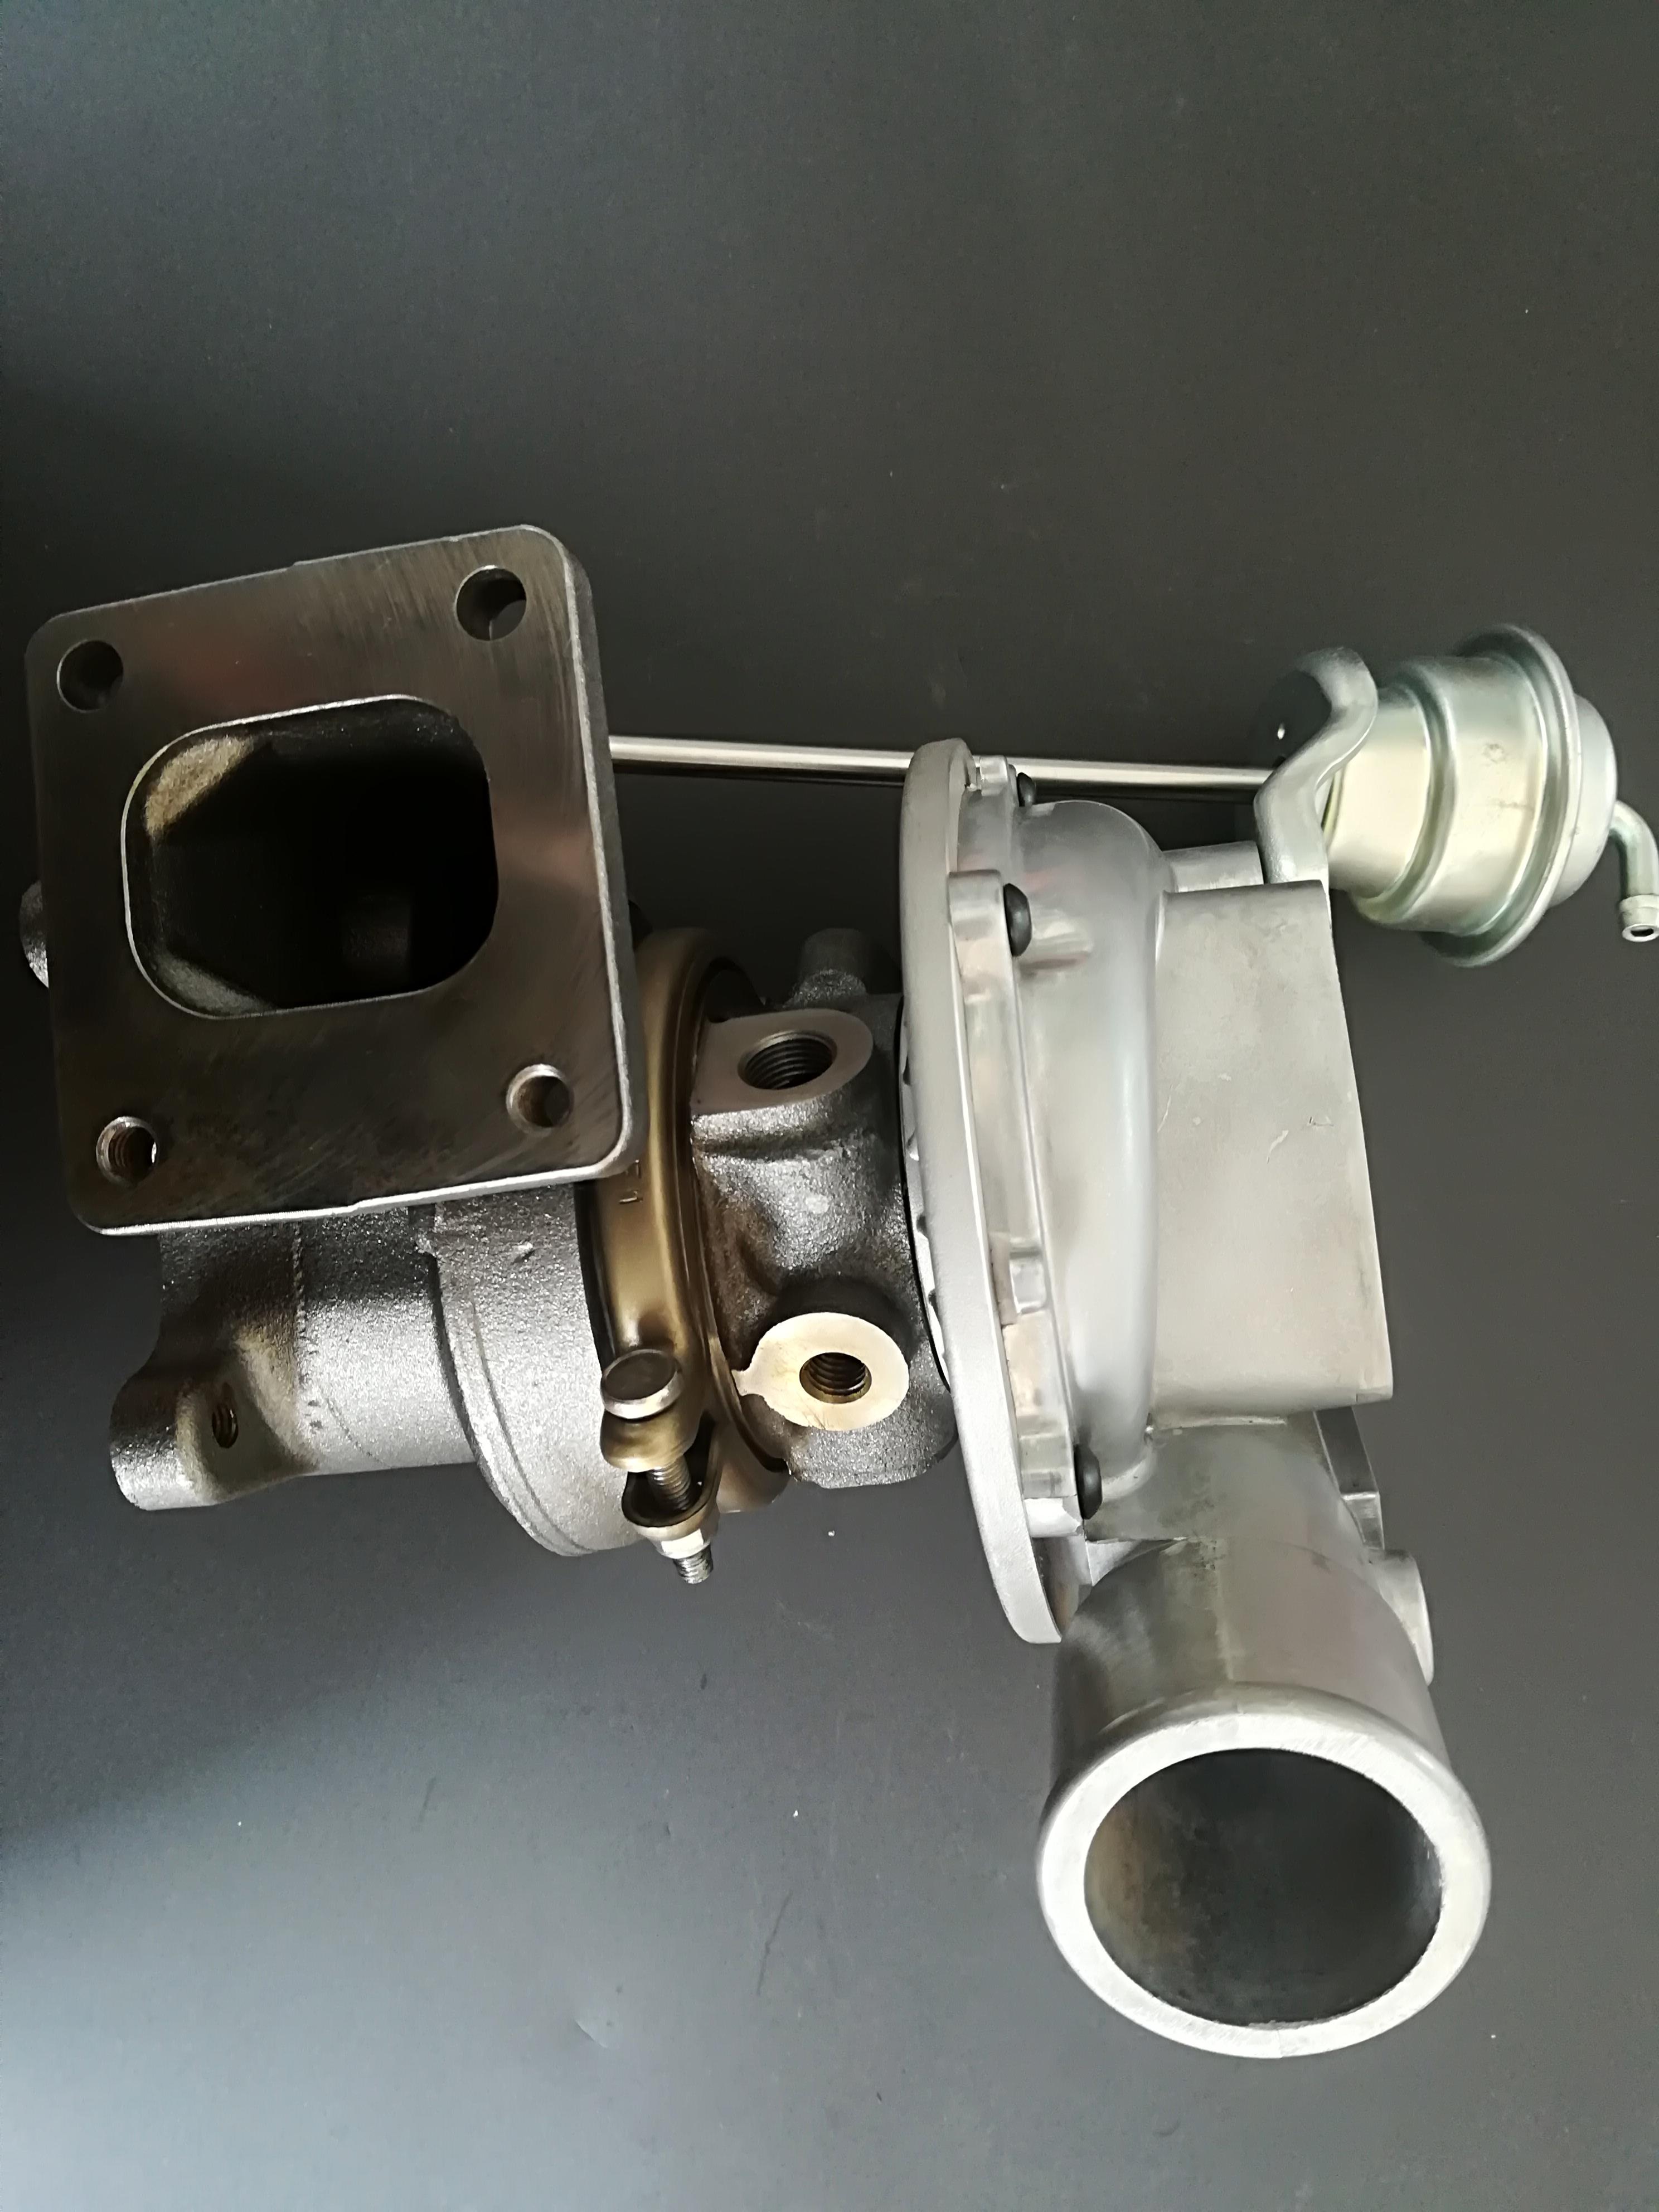 KHF5-2B turbocharger for Hyundai Terracan Car engine parts RHF5-2B turbo charger 28201-4X701 28201-4X700